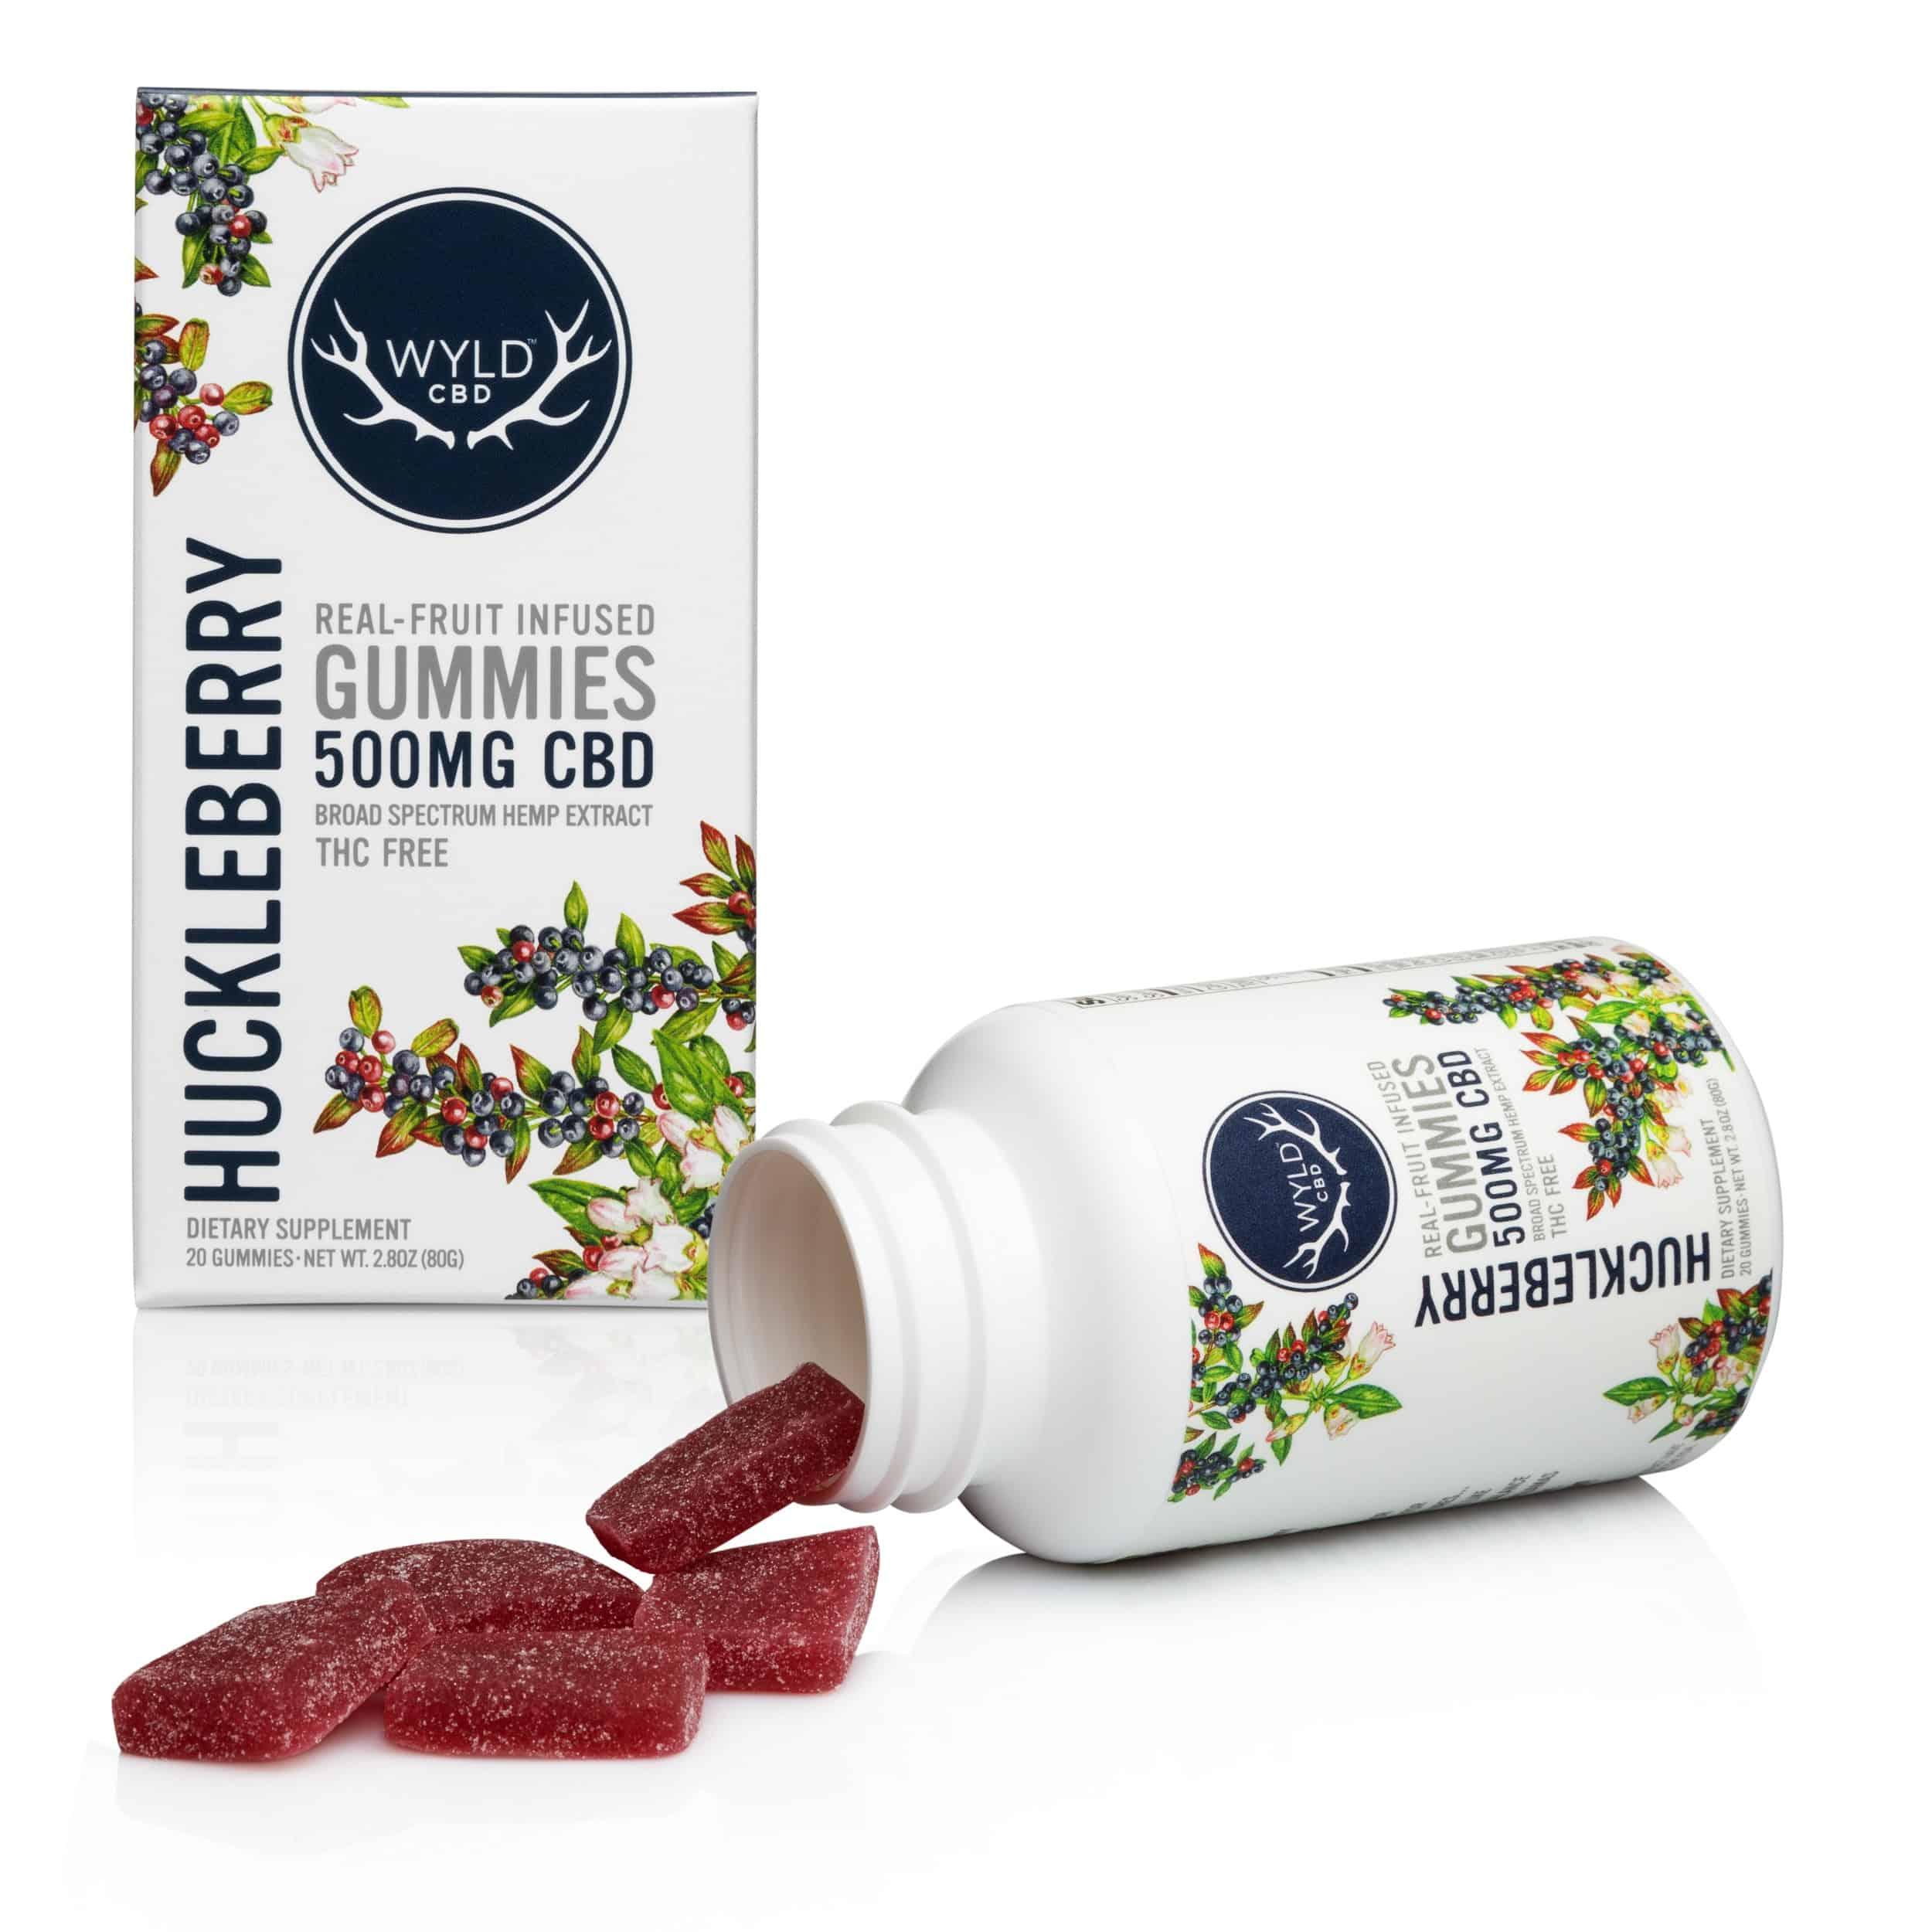 Wyld CBD Huckleberry Gummies